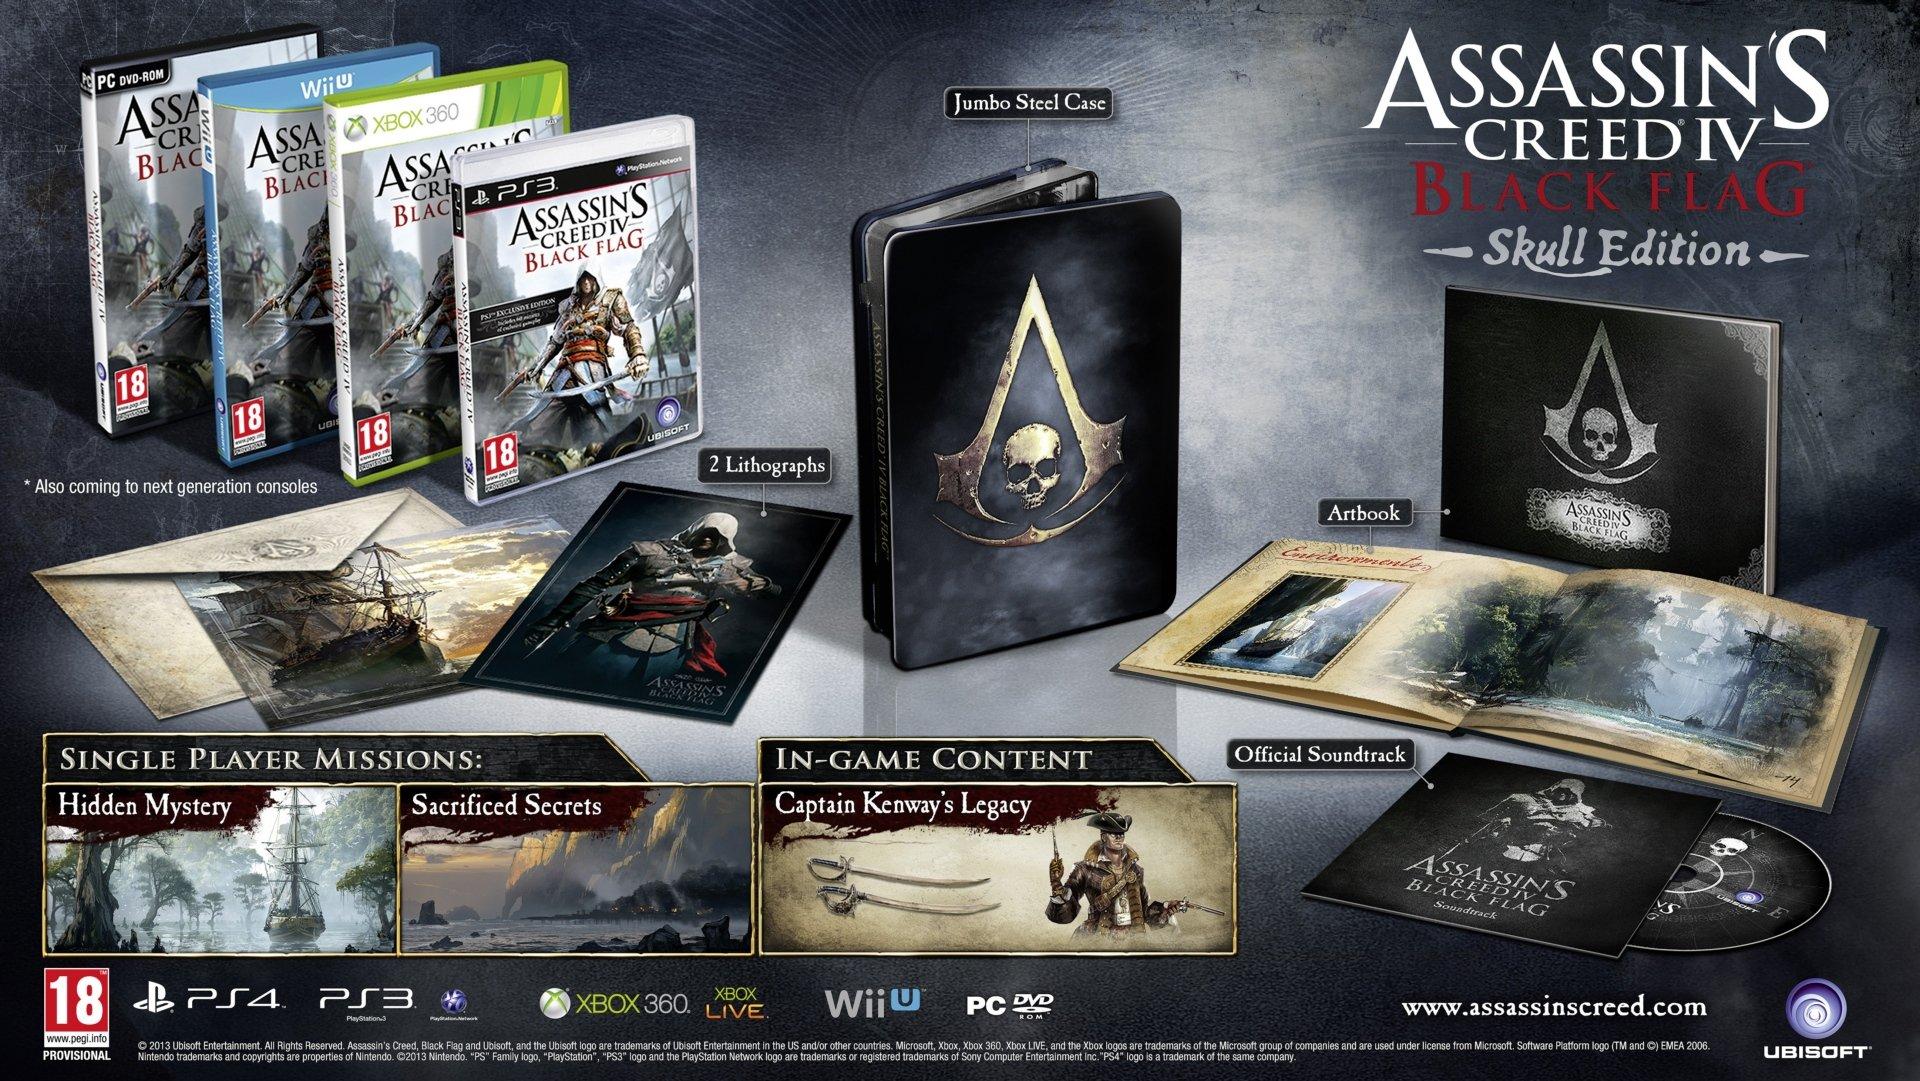 youtube.com/watch?feature=player_embedded&v=2dtf-ezfytMAssassin's Creed 4: Black Flag - коллекционные издания и  .... - Изображение 3